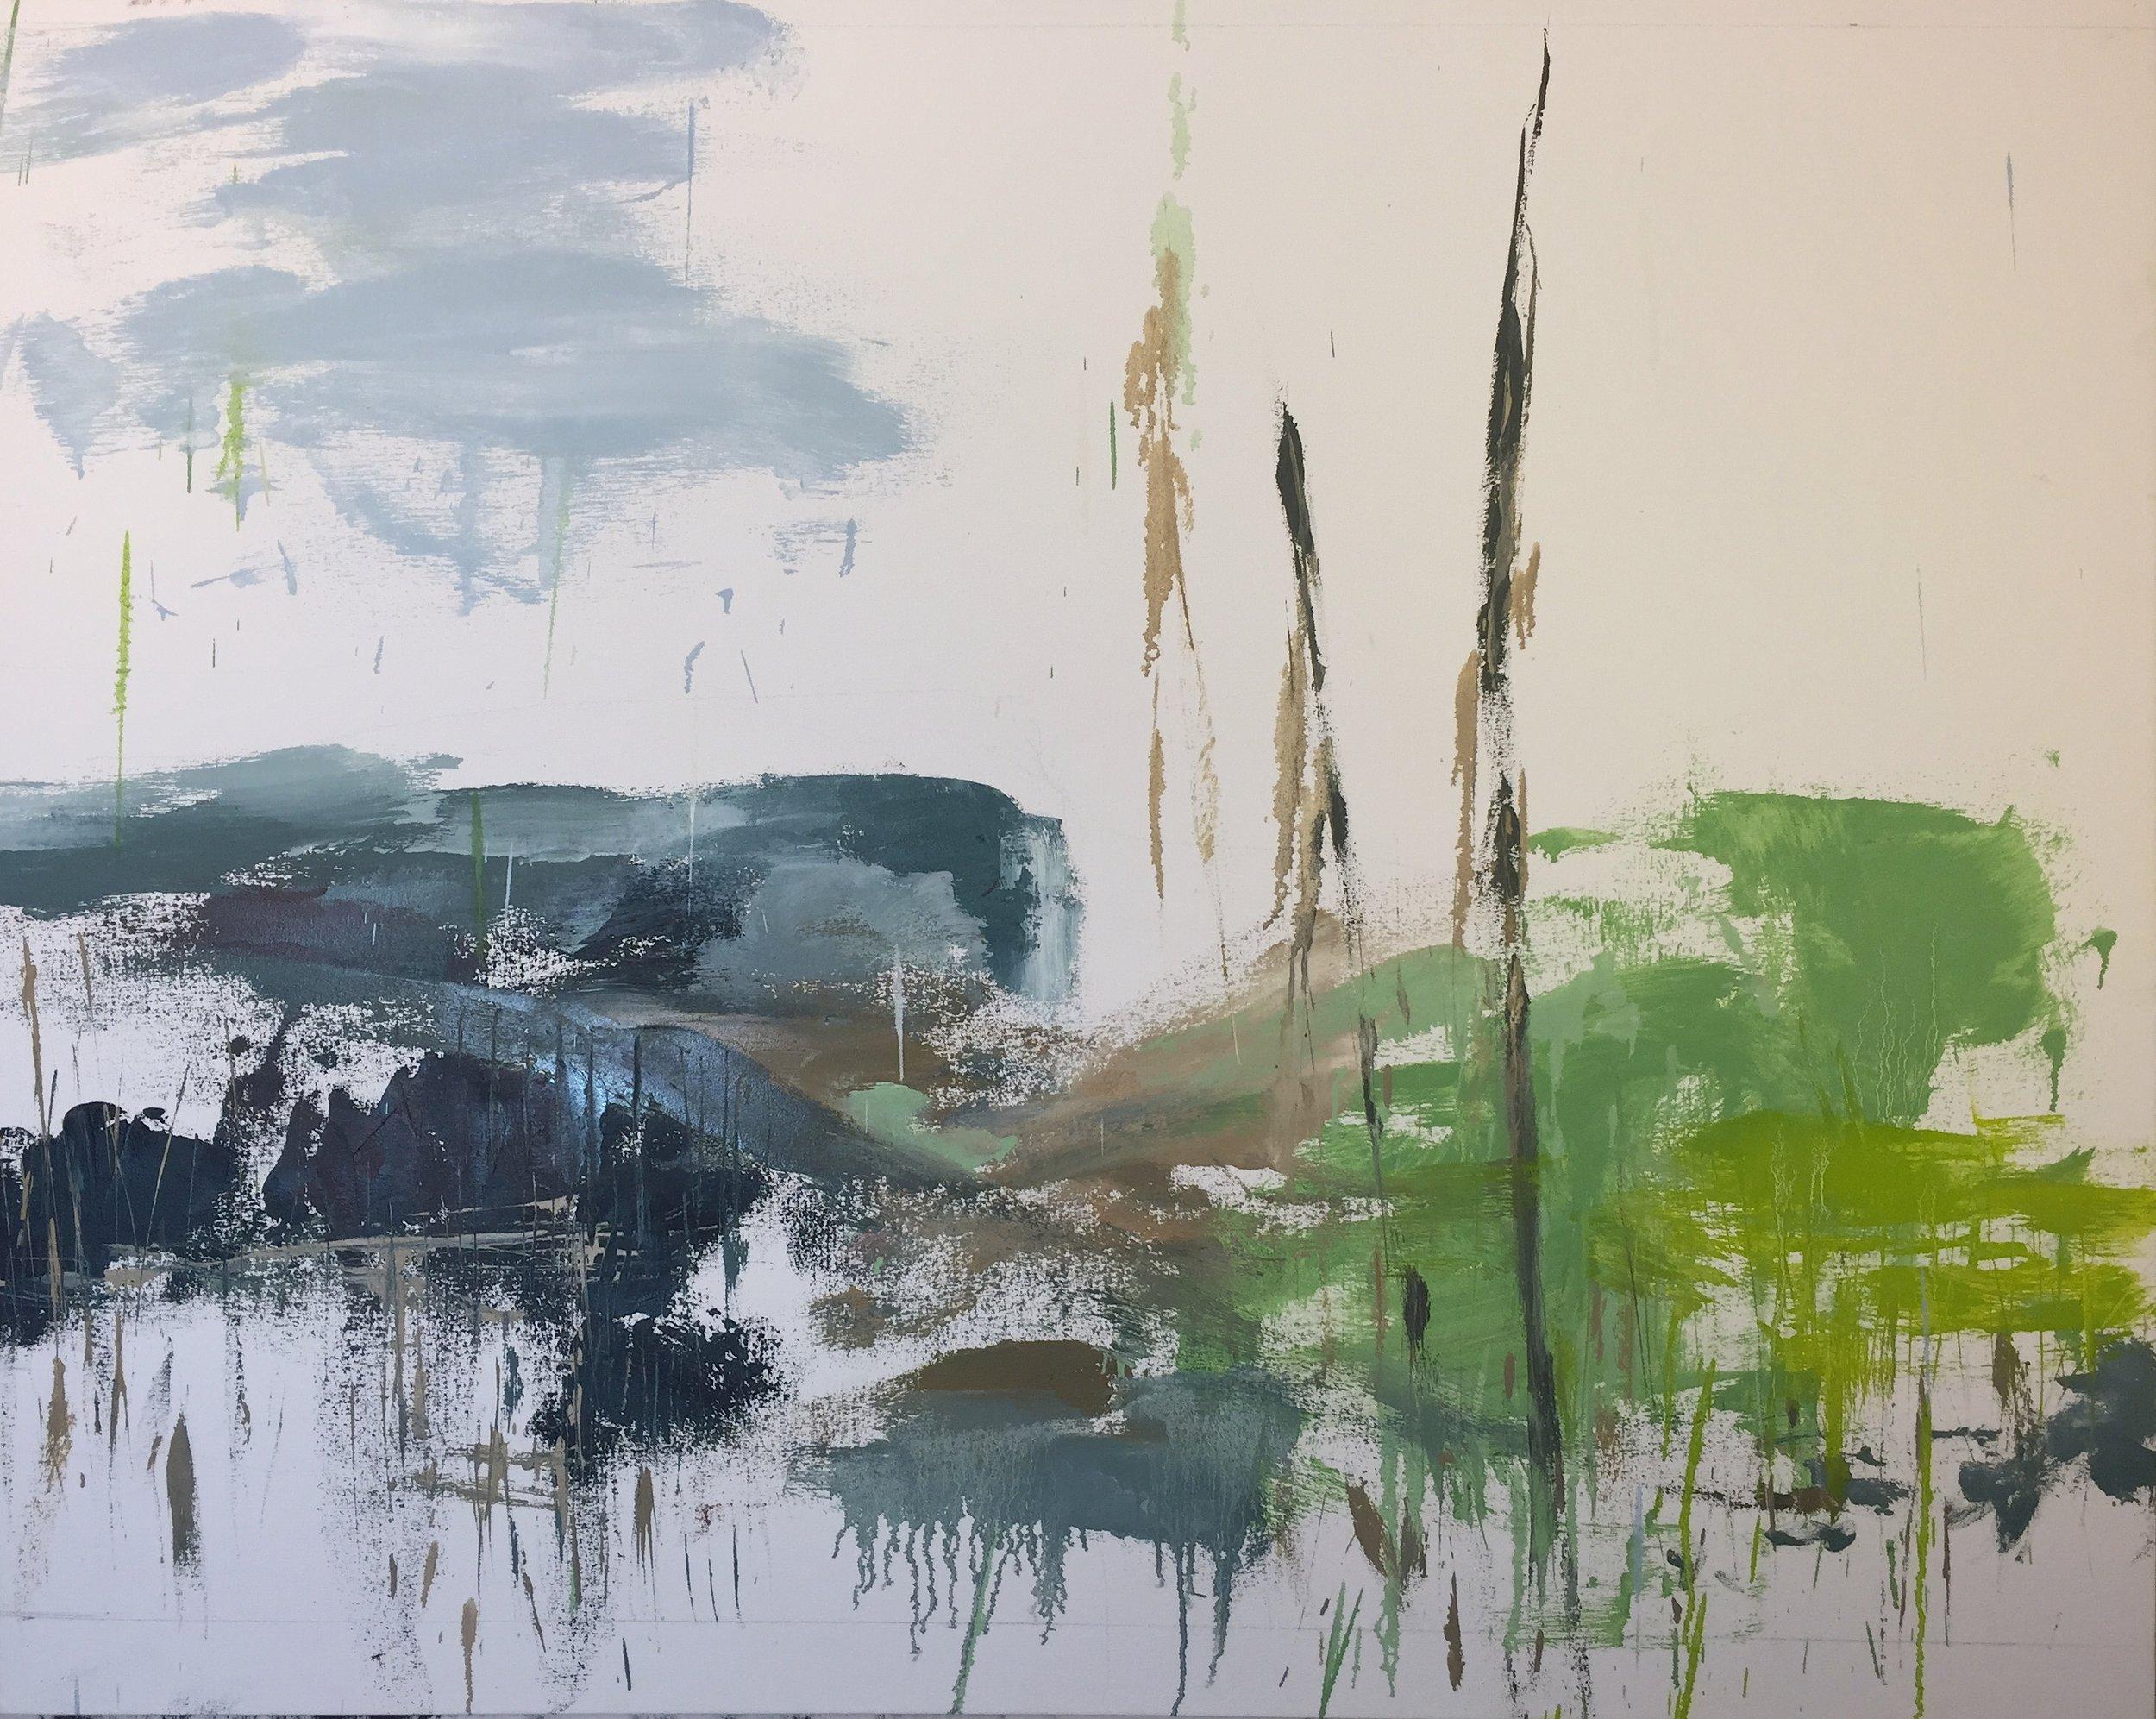 Imagined Landscape 1, 2009